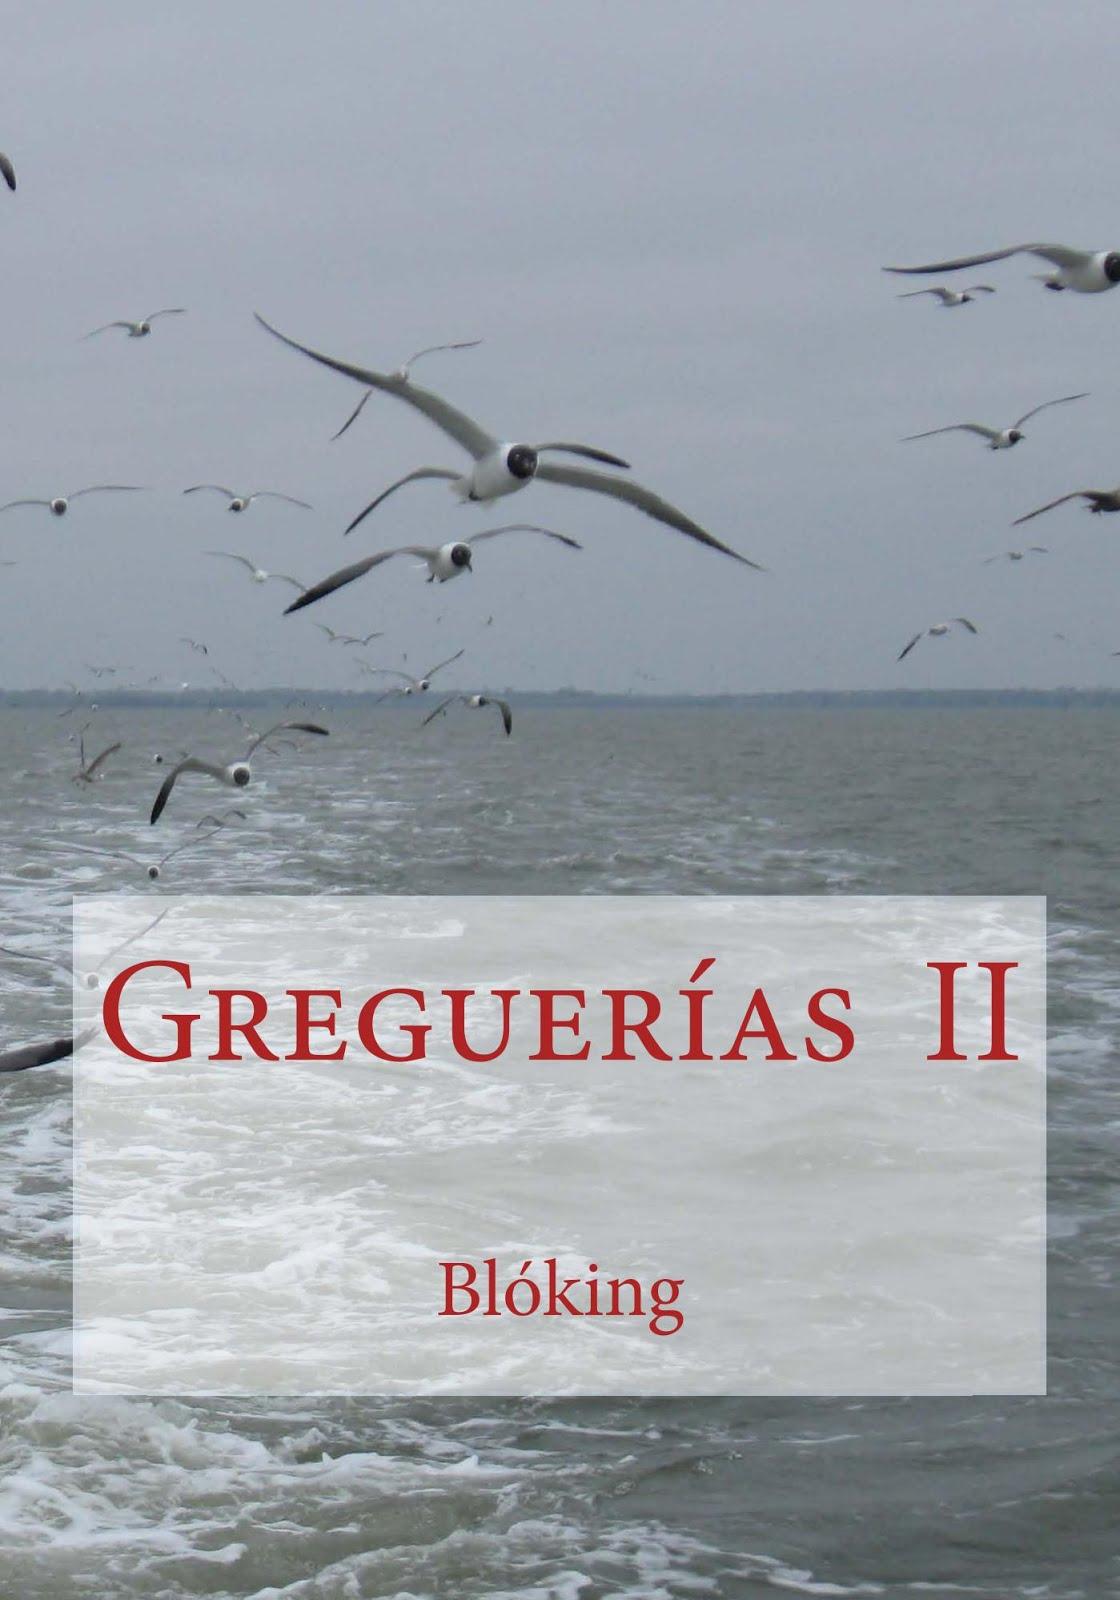 #Obra 38 - Greguerías II